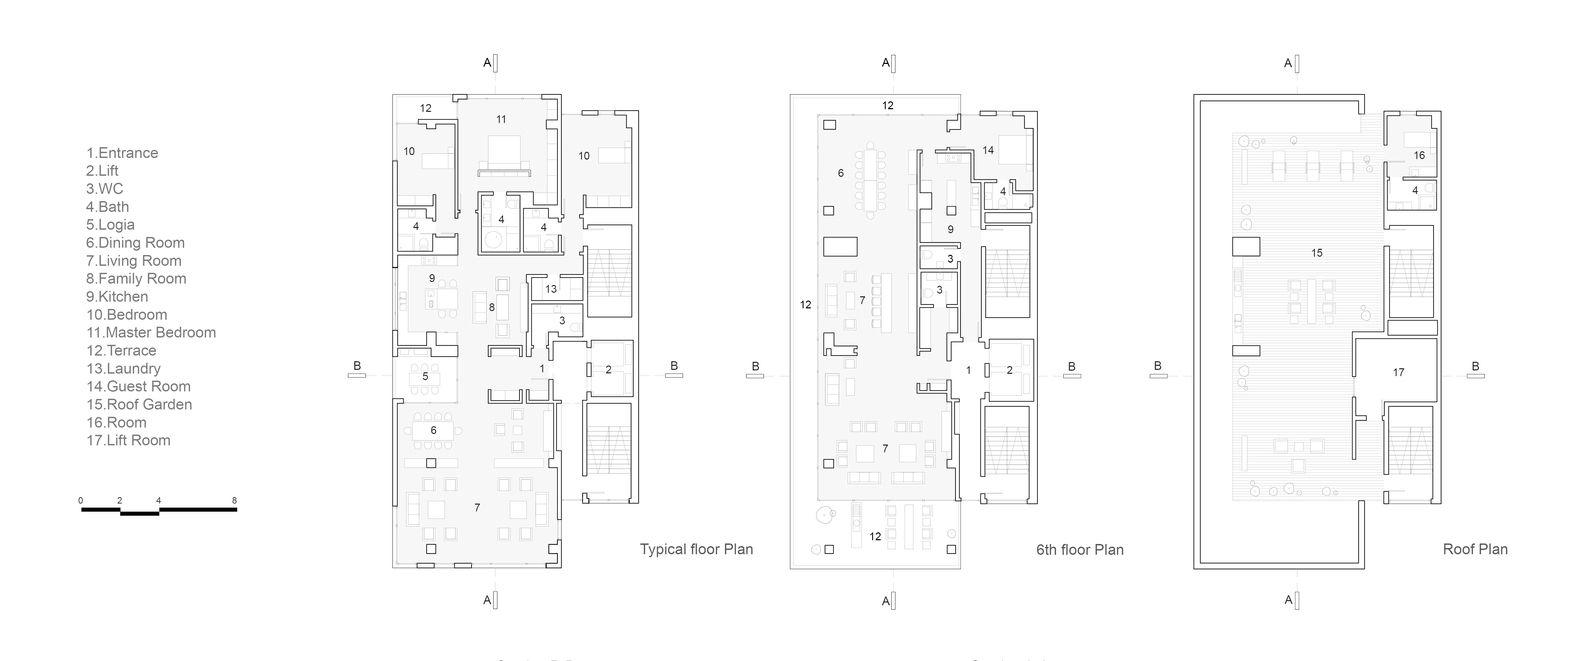 Bw7 Floor Plan How To Plan Floor Plans Roof Plan